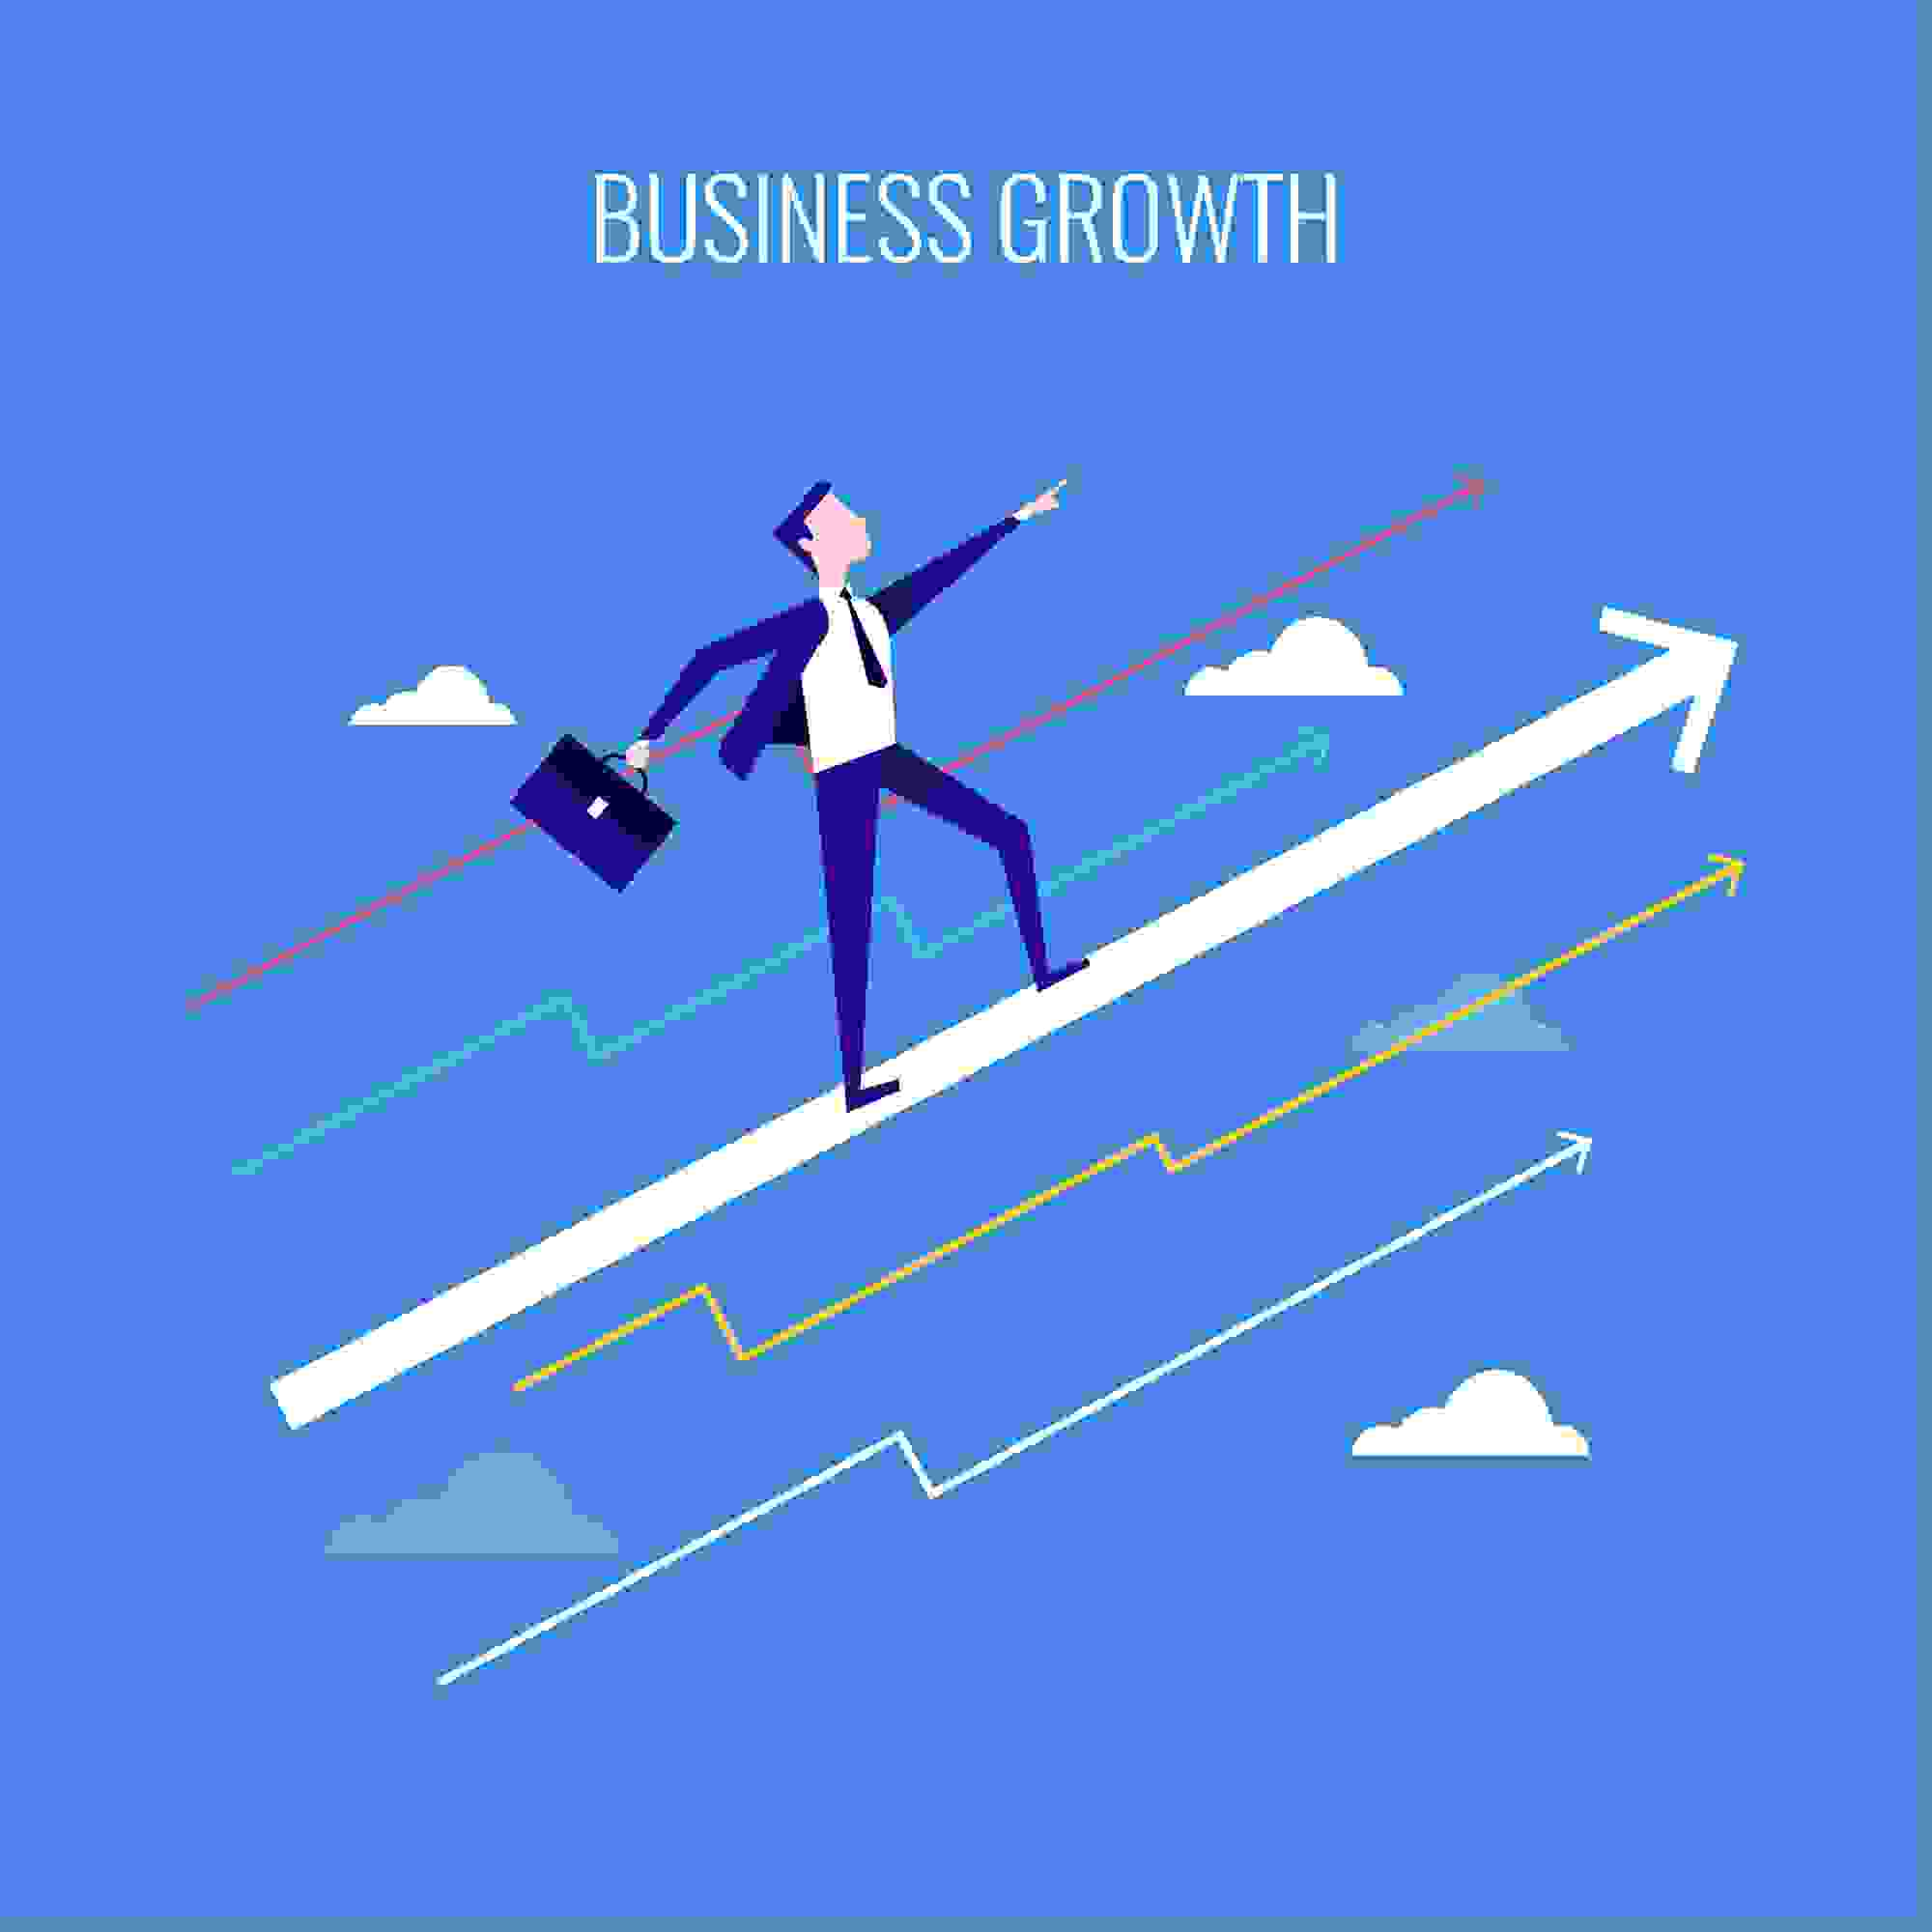 5 Amazon Hacks to Grow Your Business